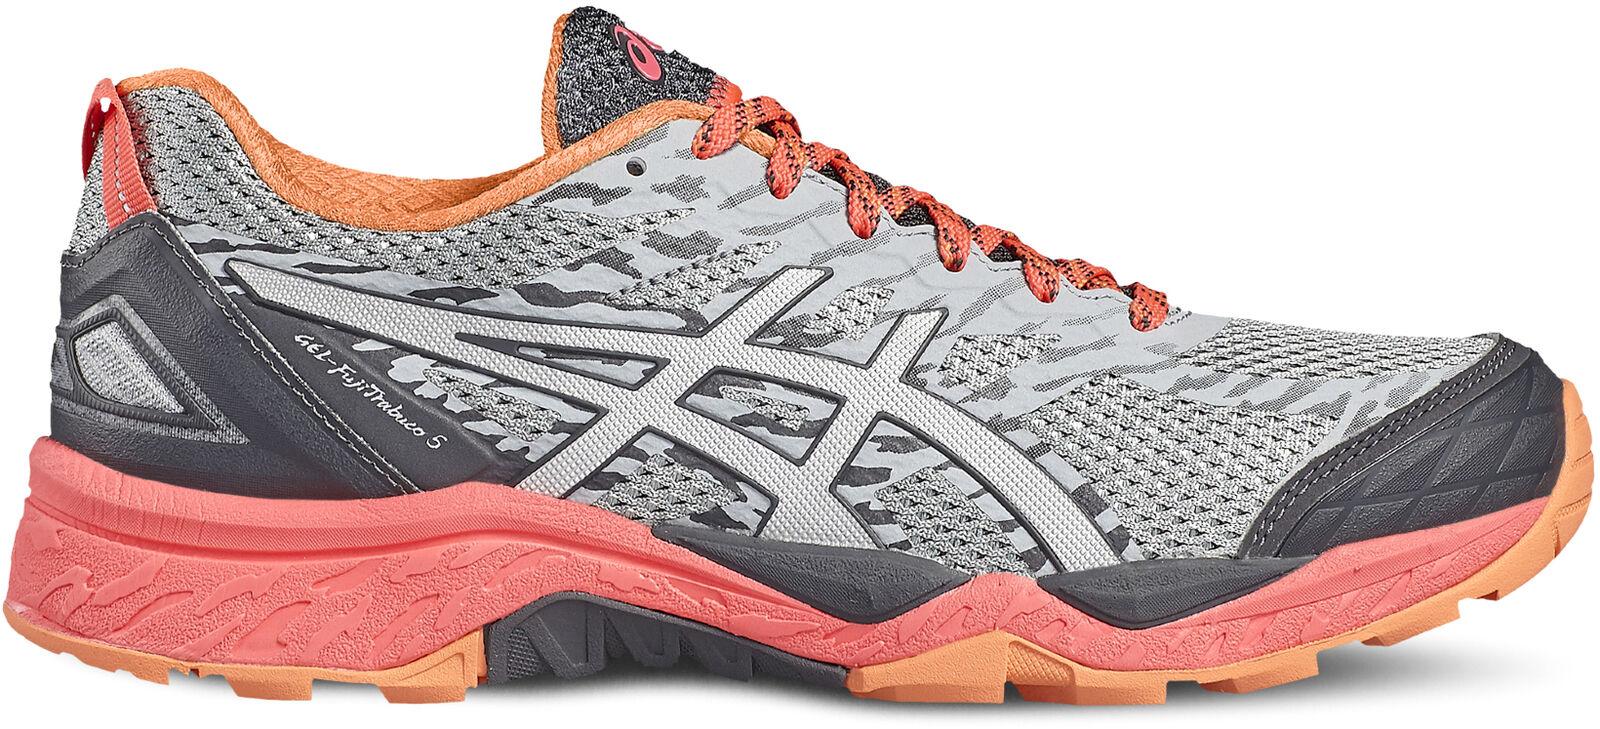 Asics Gel FujiTrabuco 5 Damenschuhe Trail Running Schuhes - Grau